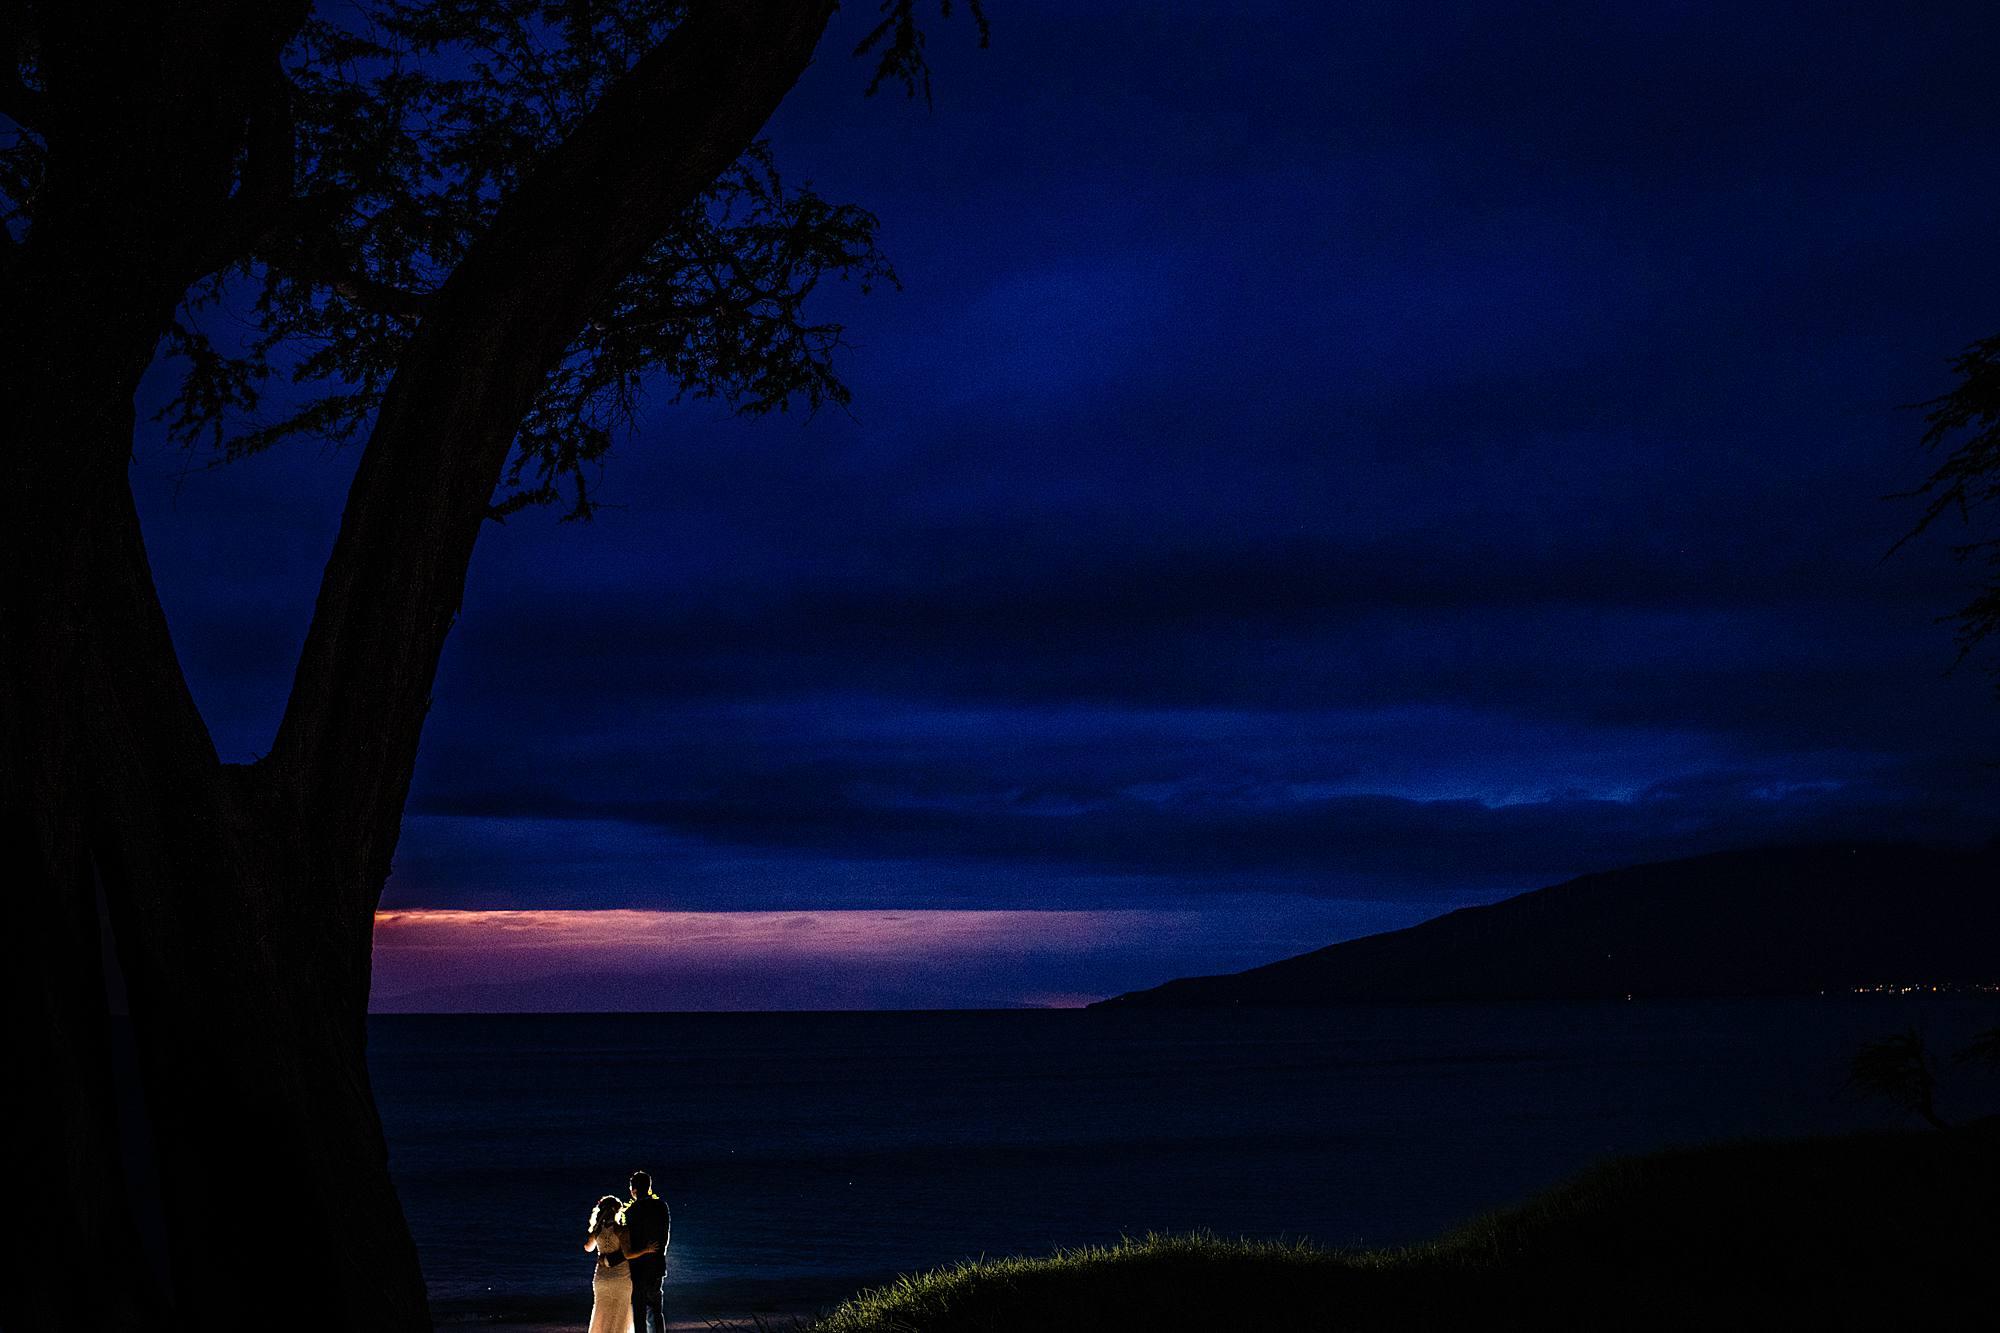 sunset in kihei hawaii with bride and groom